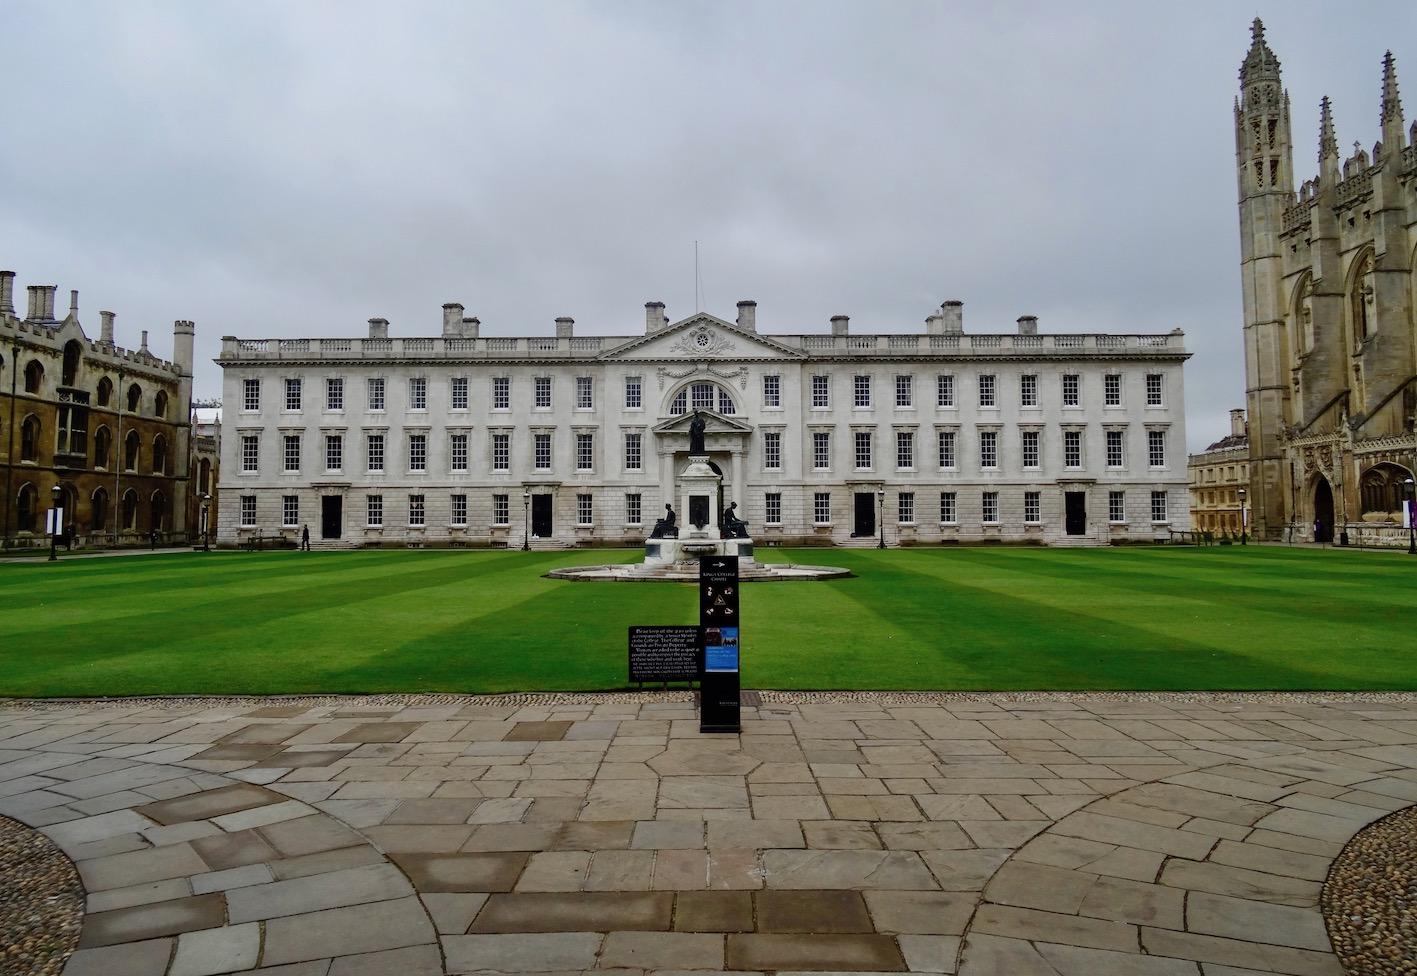 King's College Cambridge England.